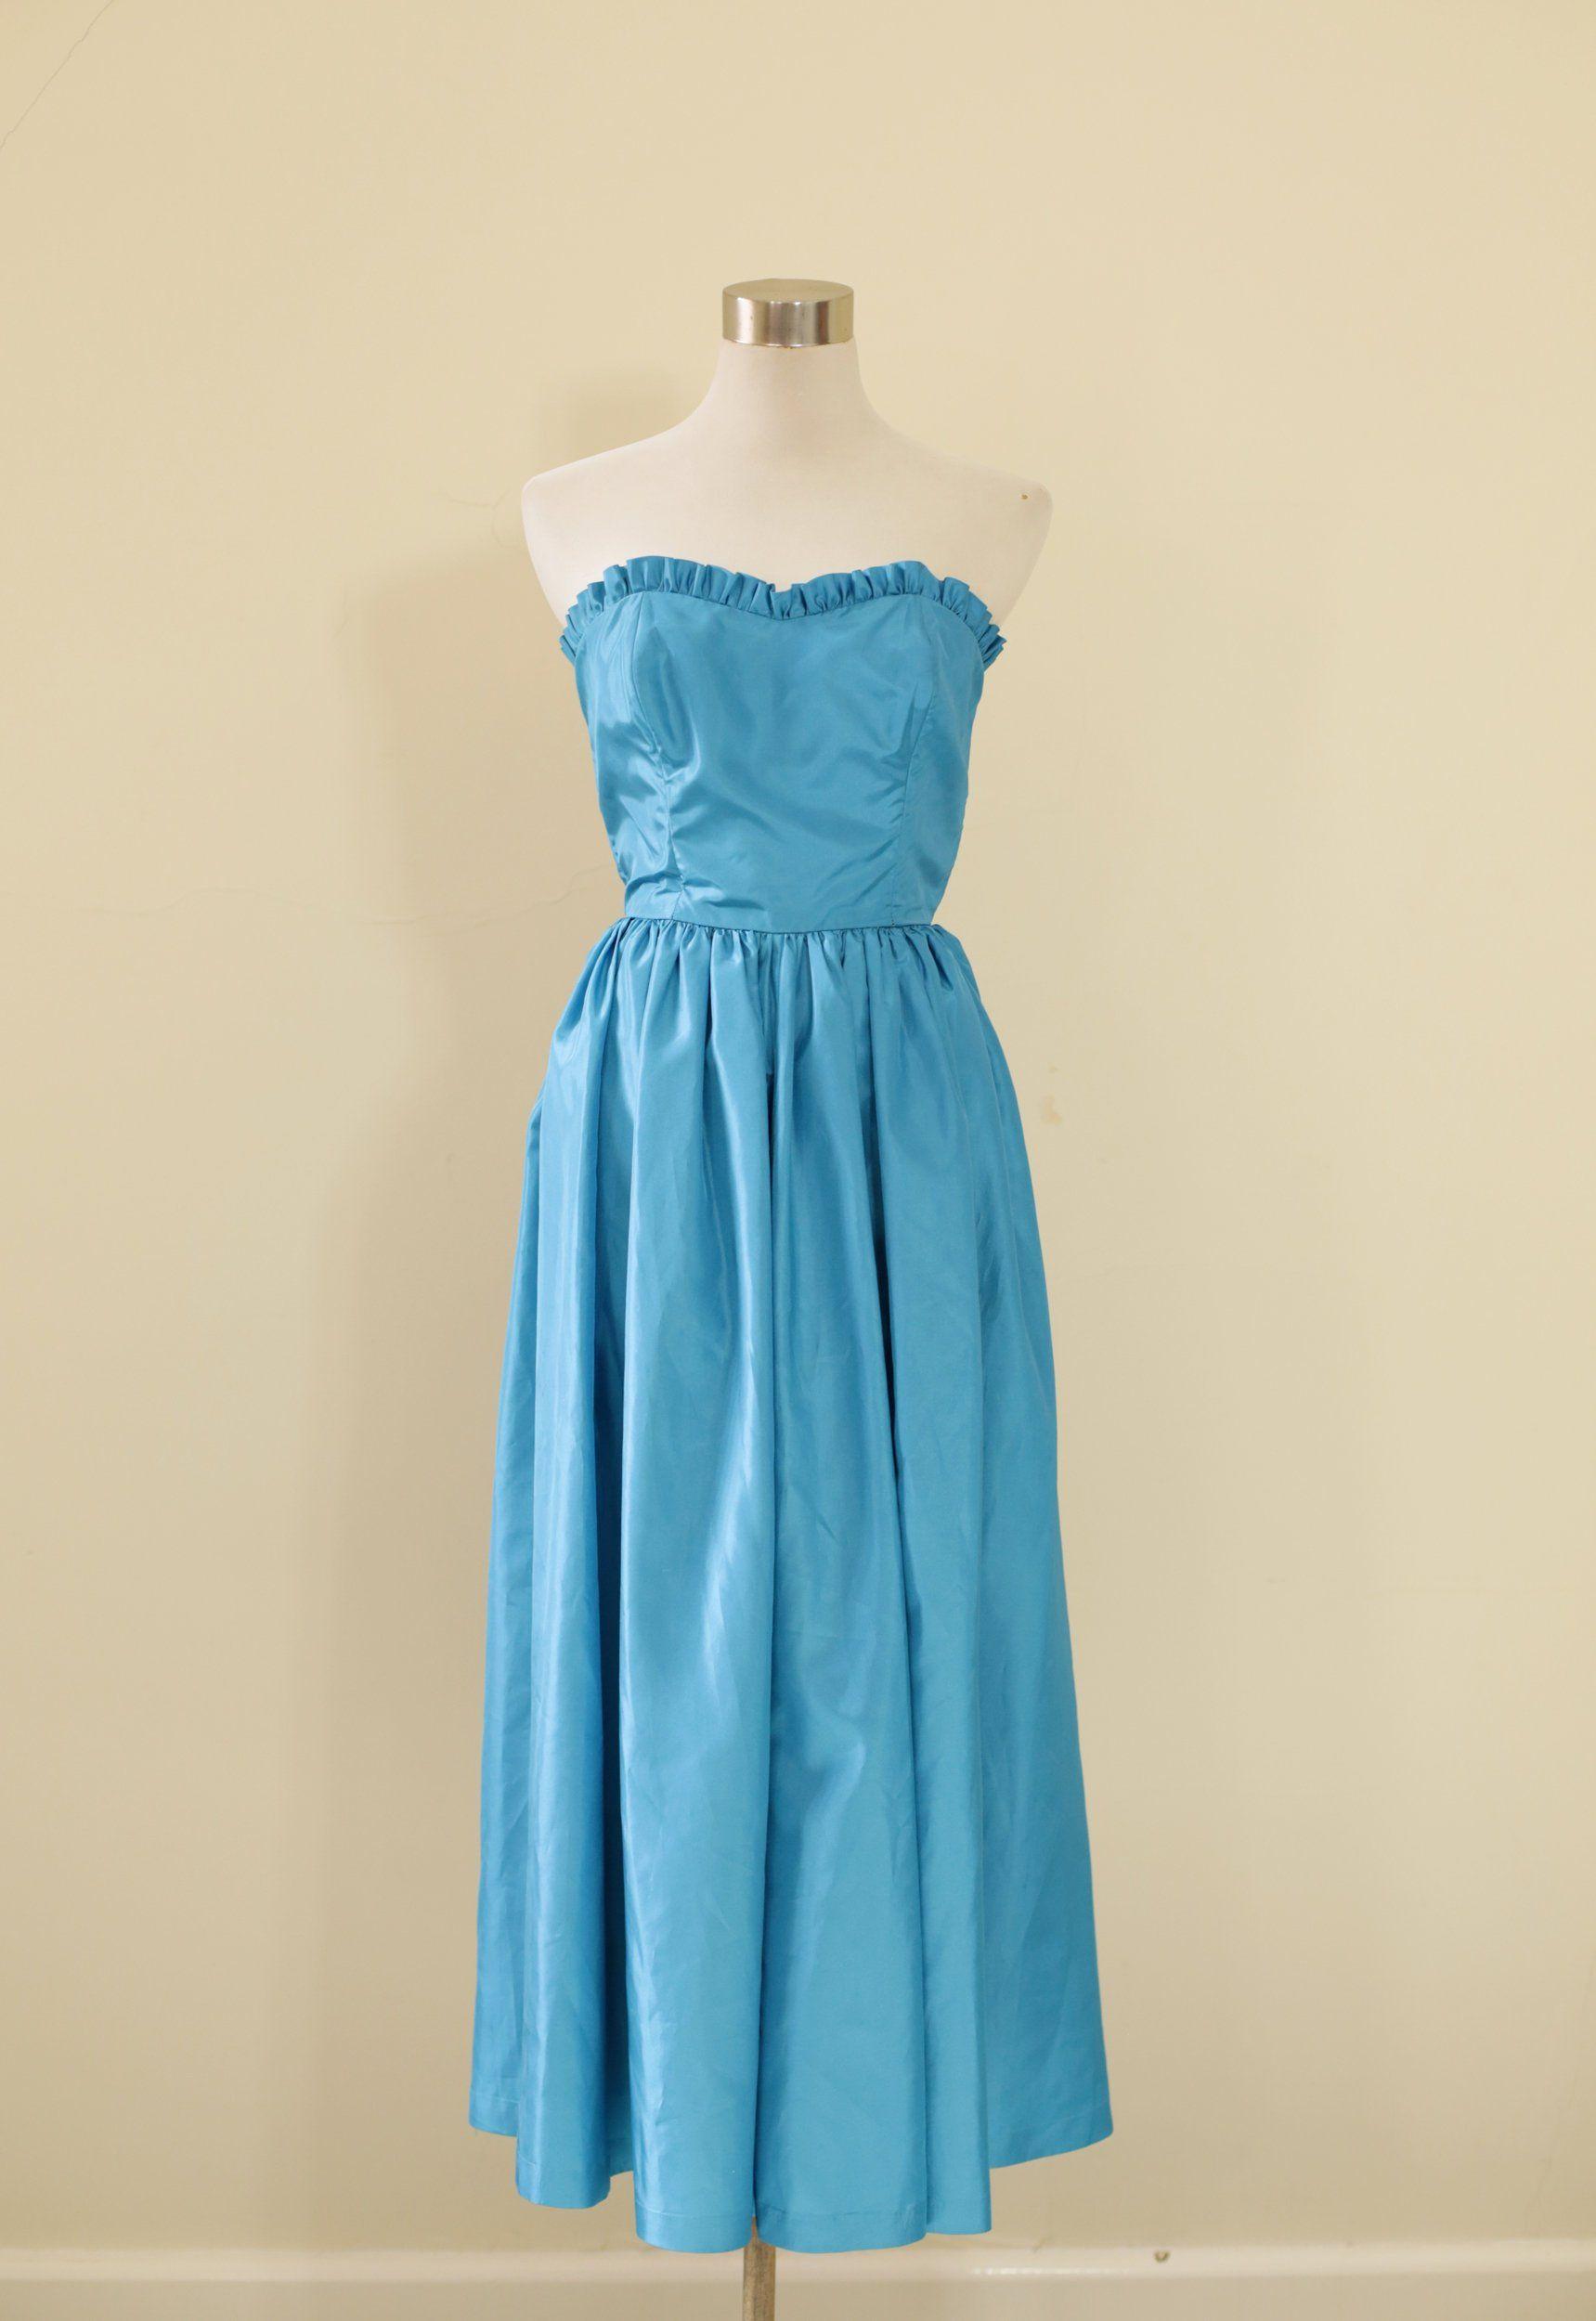 Vintage 60s Aqua Prom Dress With Frill Detail And Button Back Etsy Aqua Prom Dress Dresses 60s Fashion Dresses [ 2500 x 1719 Pixel ]